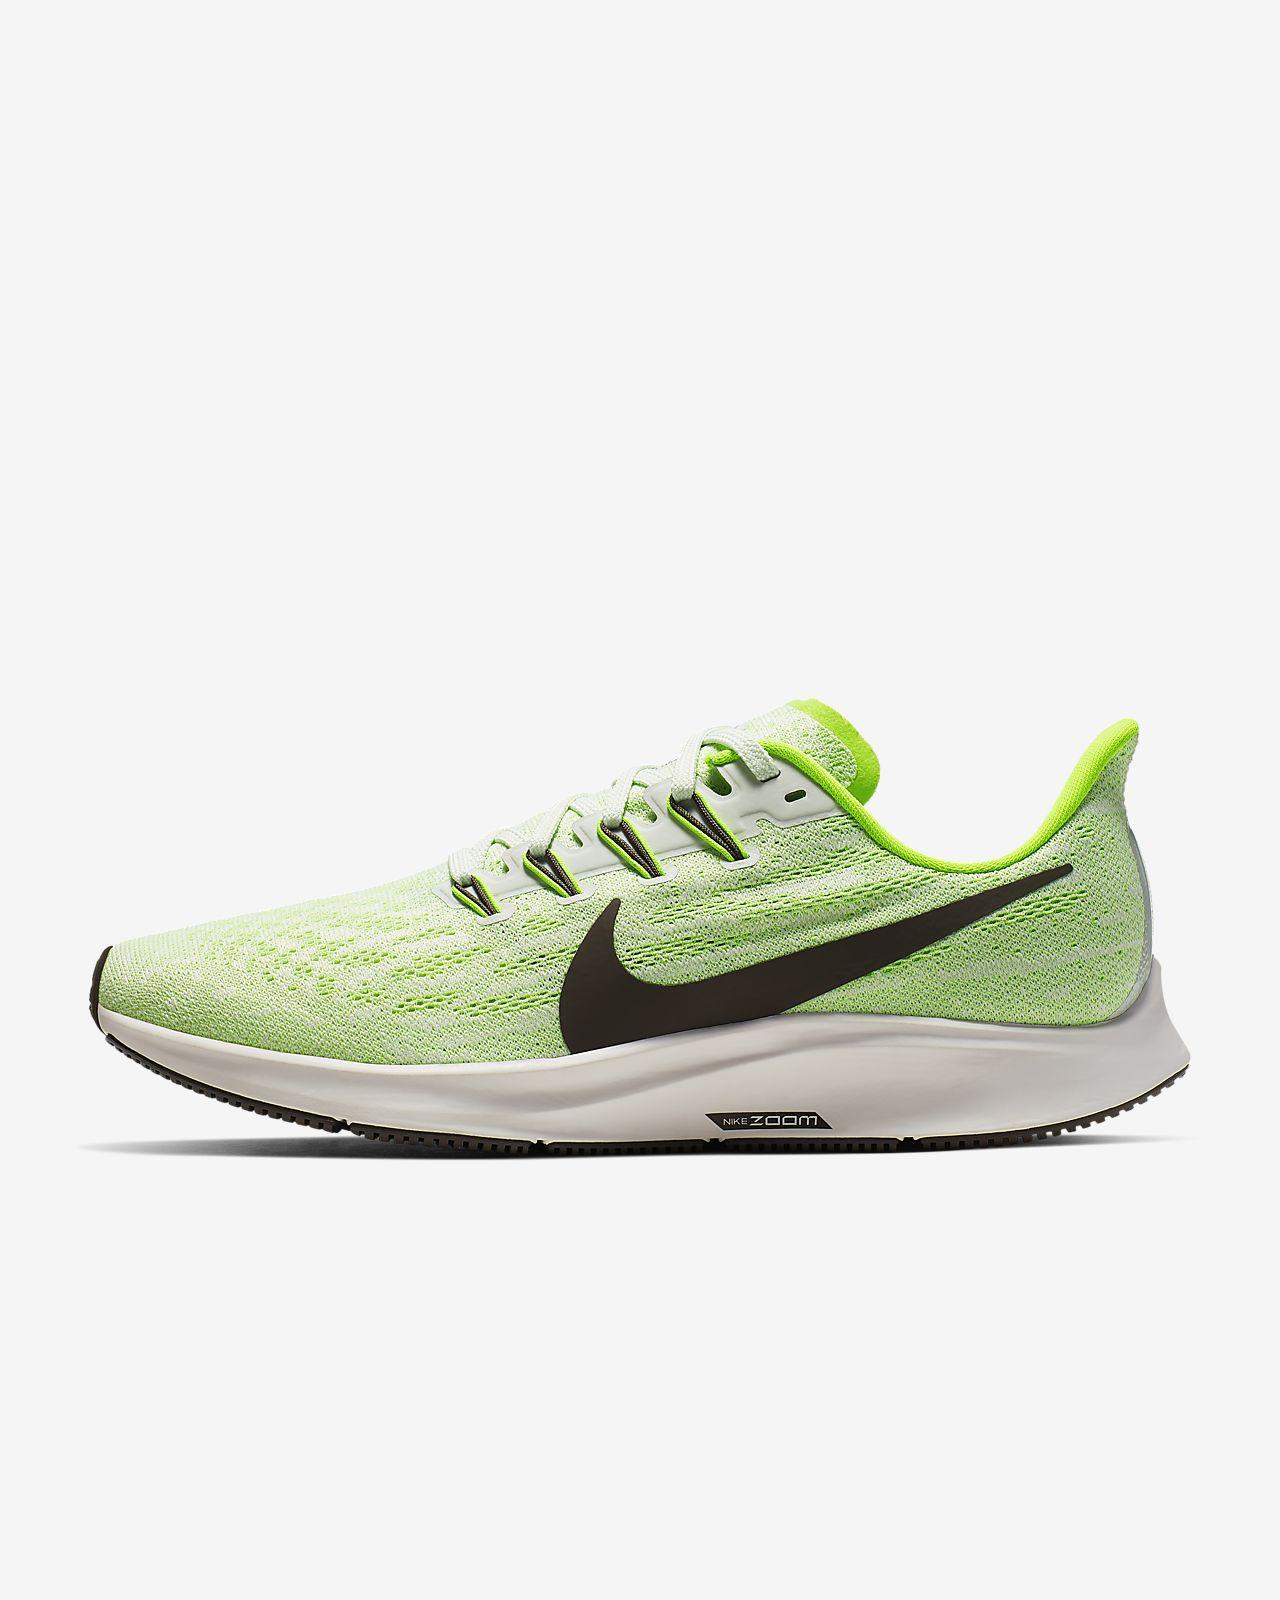 Nike Big Nike Altos Hombre Para La Venta Tenis Nike